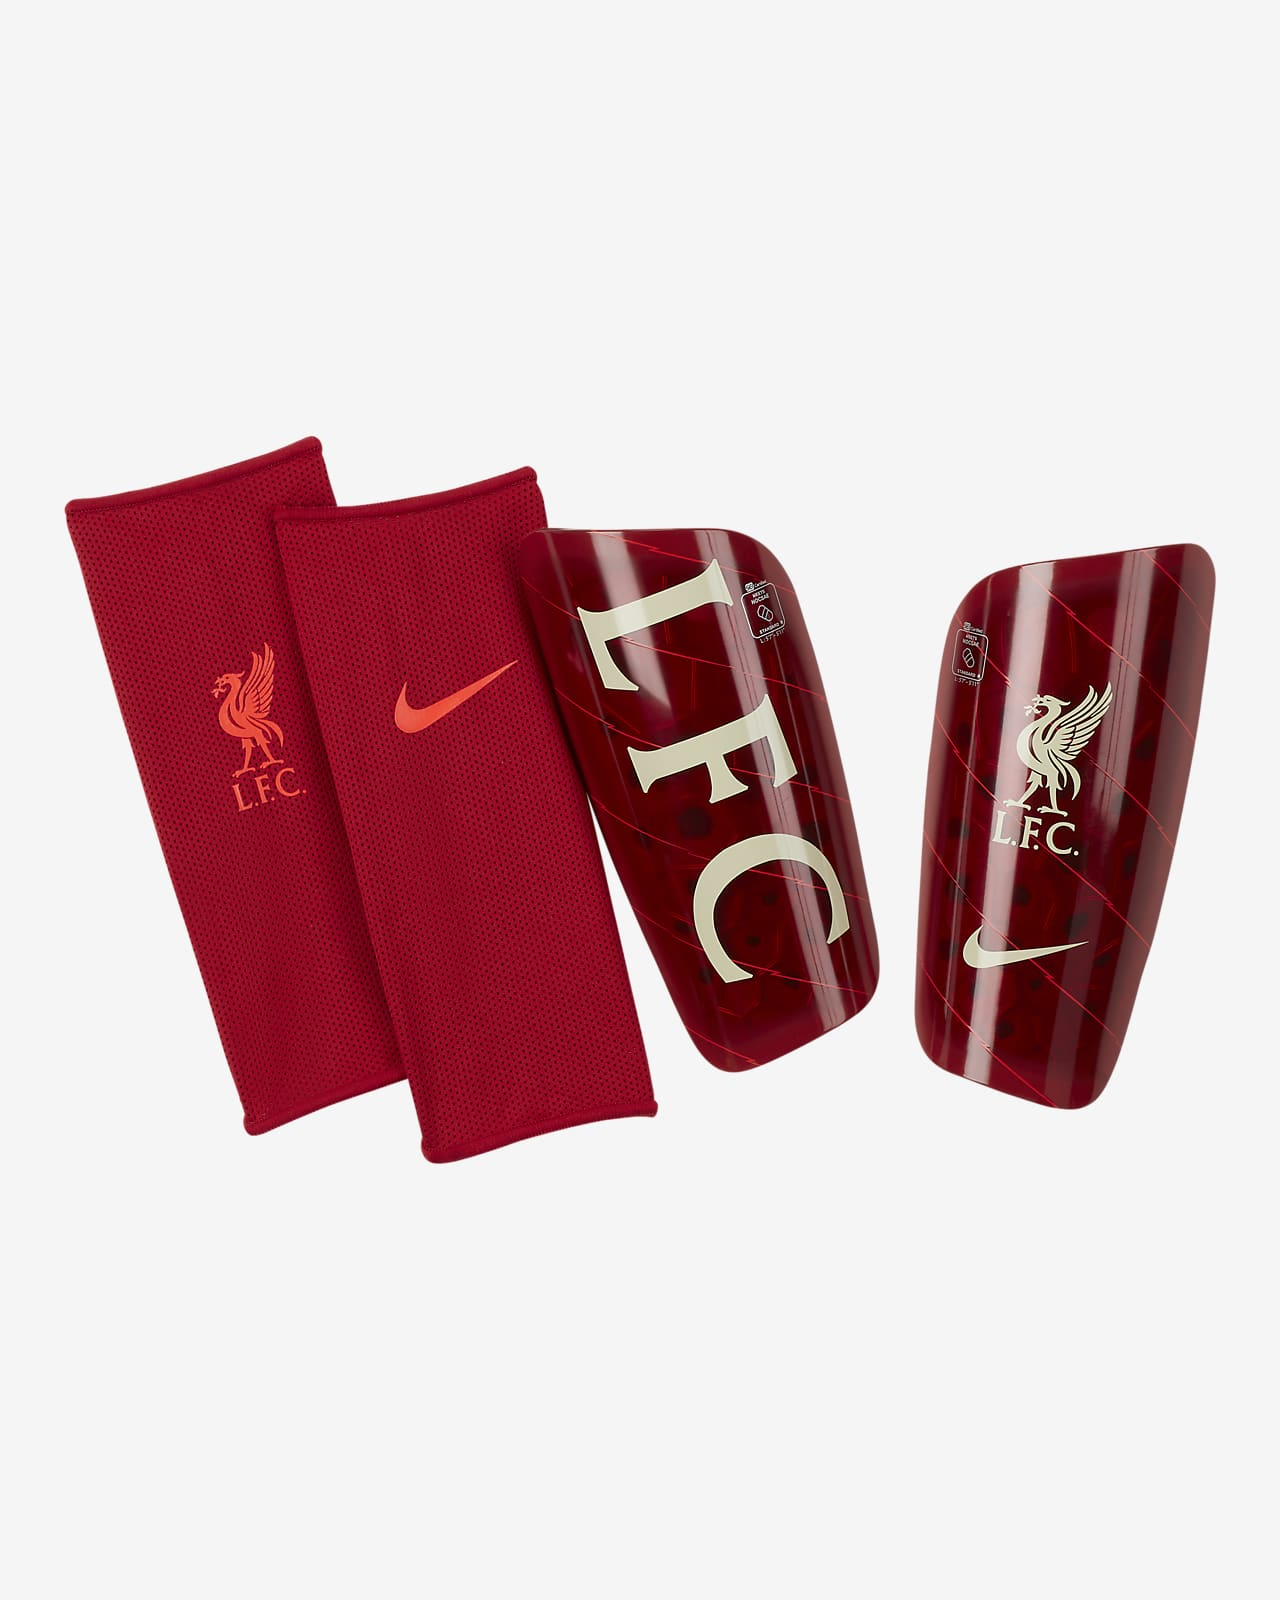 Liverpool F.C. Mercurial Lite Football Shinguards